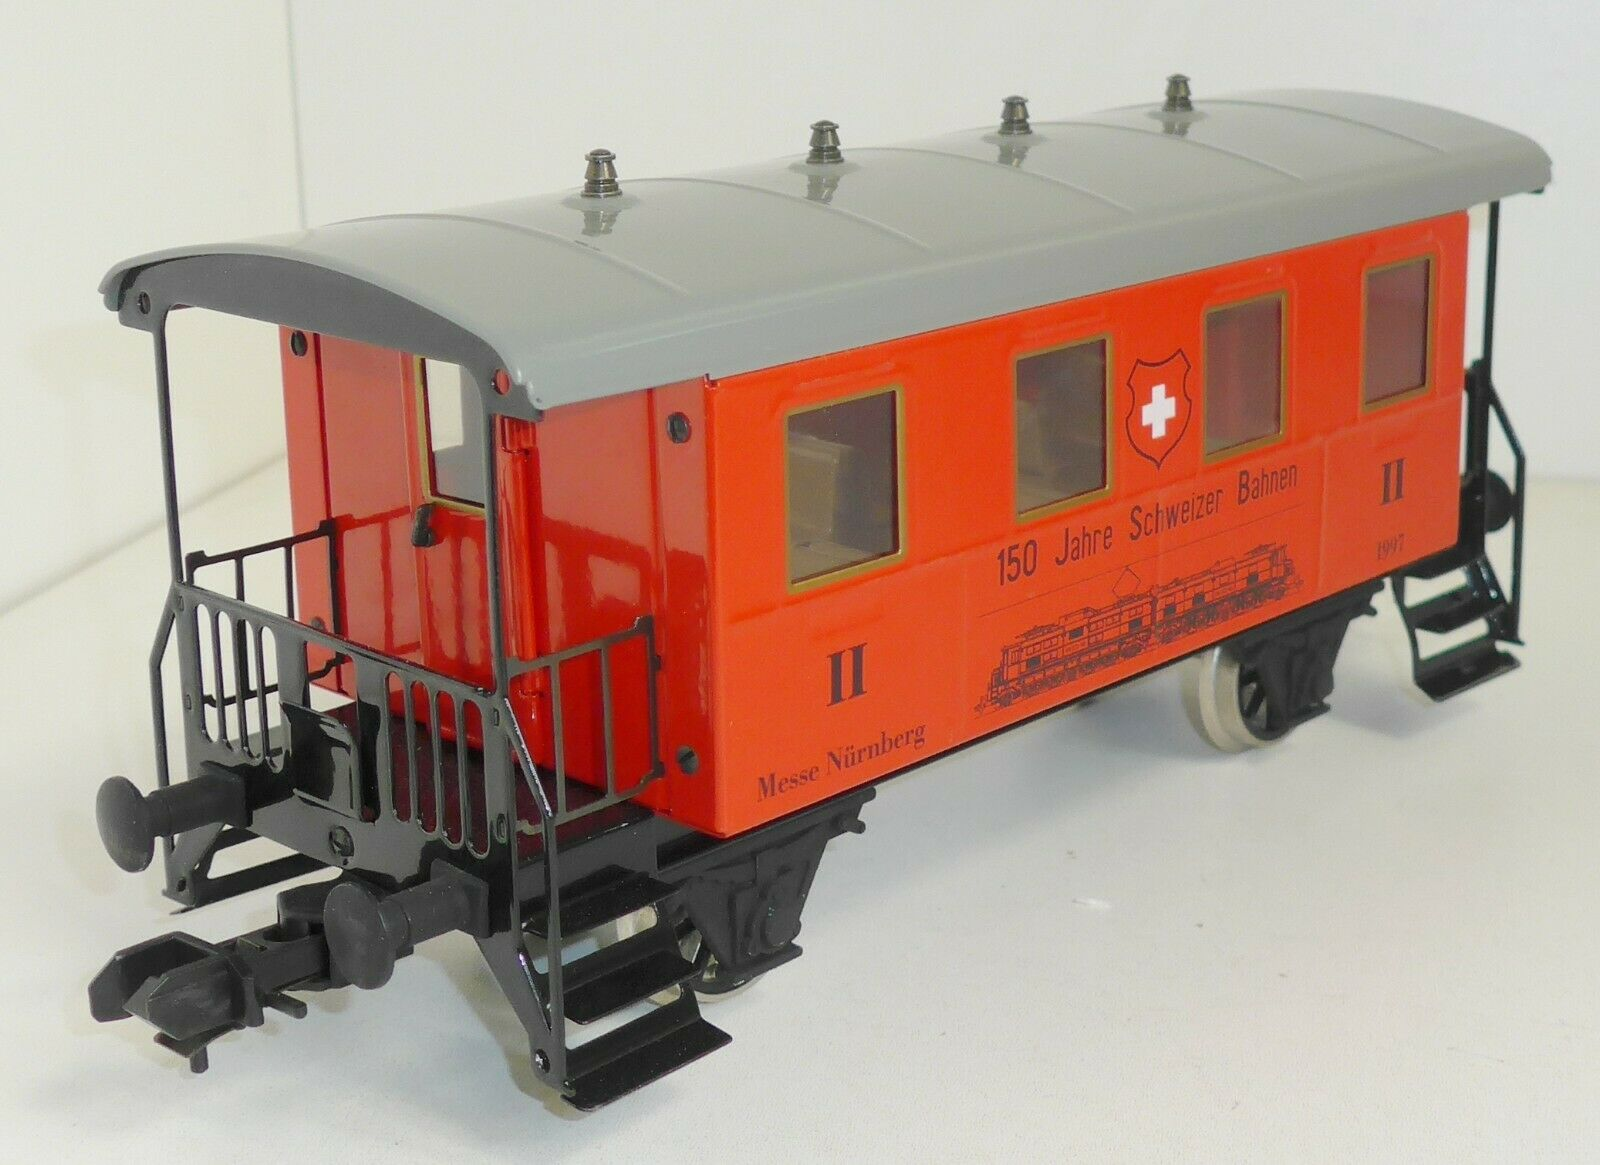 Märklin 1 MAXI vagoni 2.kl. Fiera Norimberga 1997 150 anni Ferrovie Svizzere